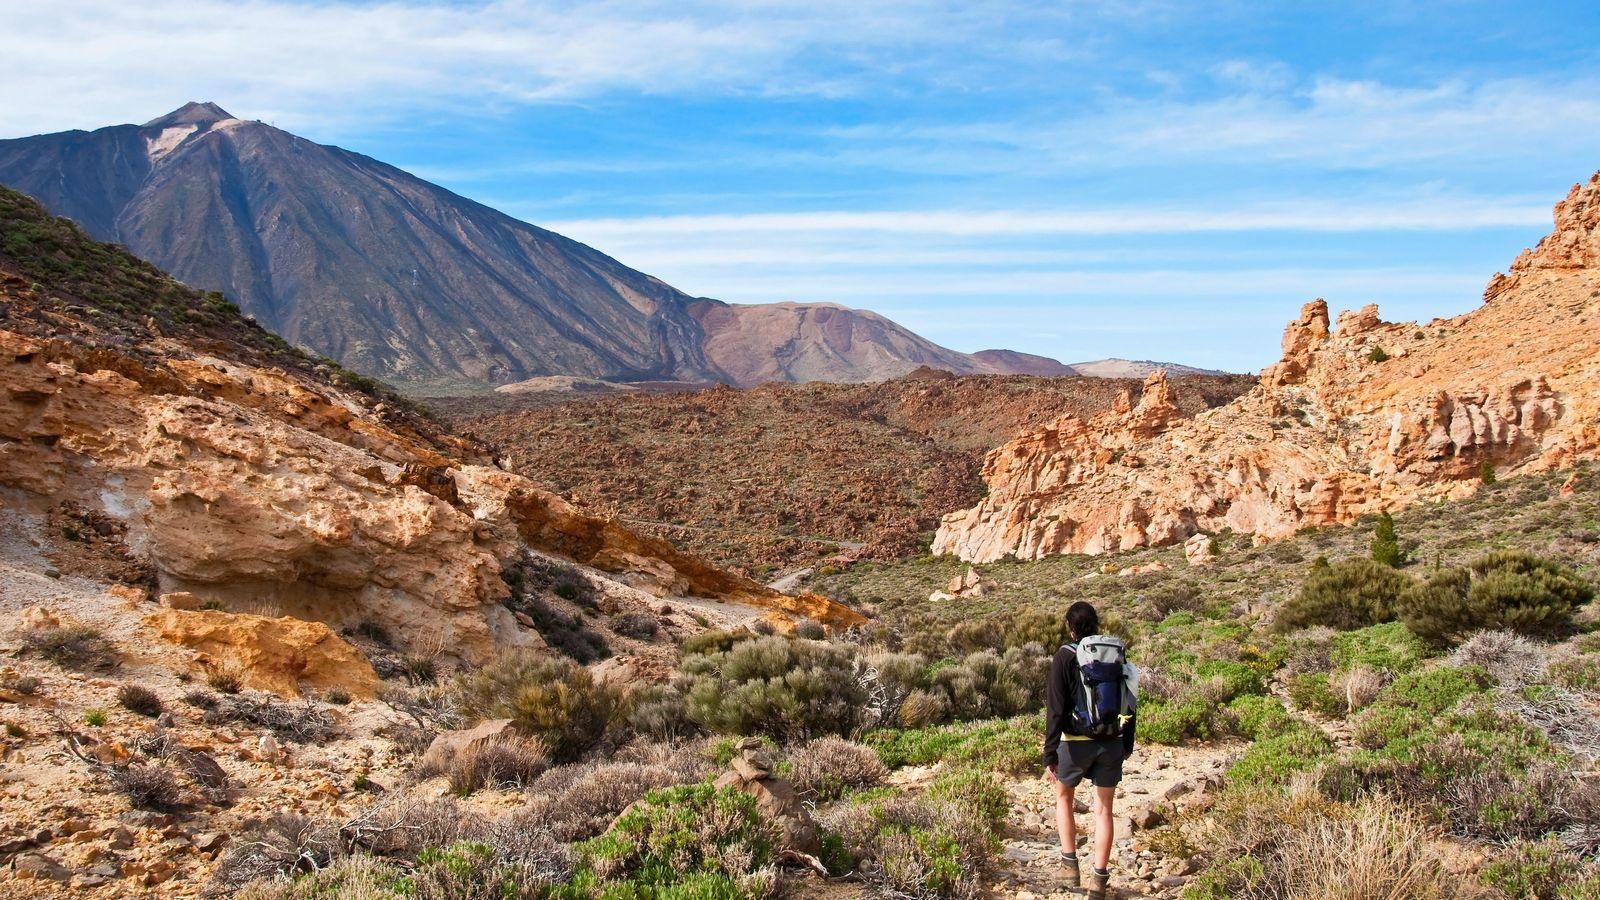 The Martian landscapes ofTeide National Park, Tenerife.